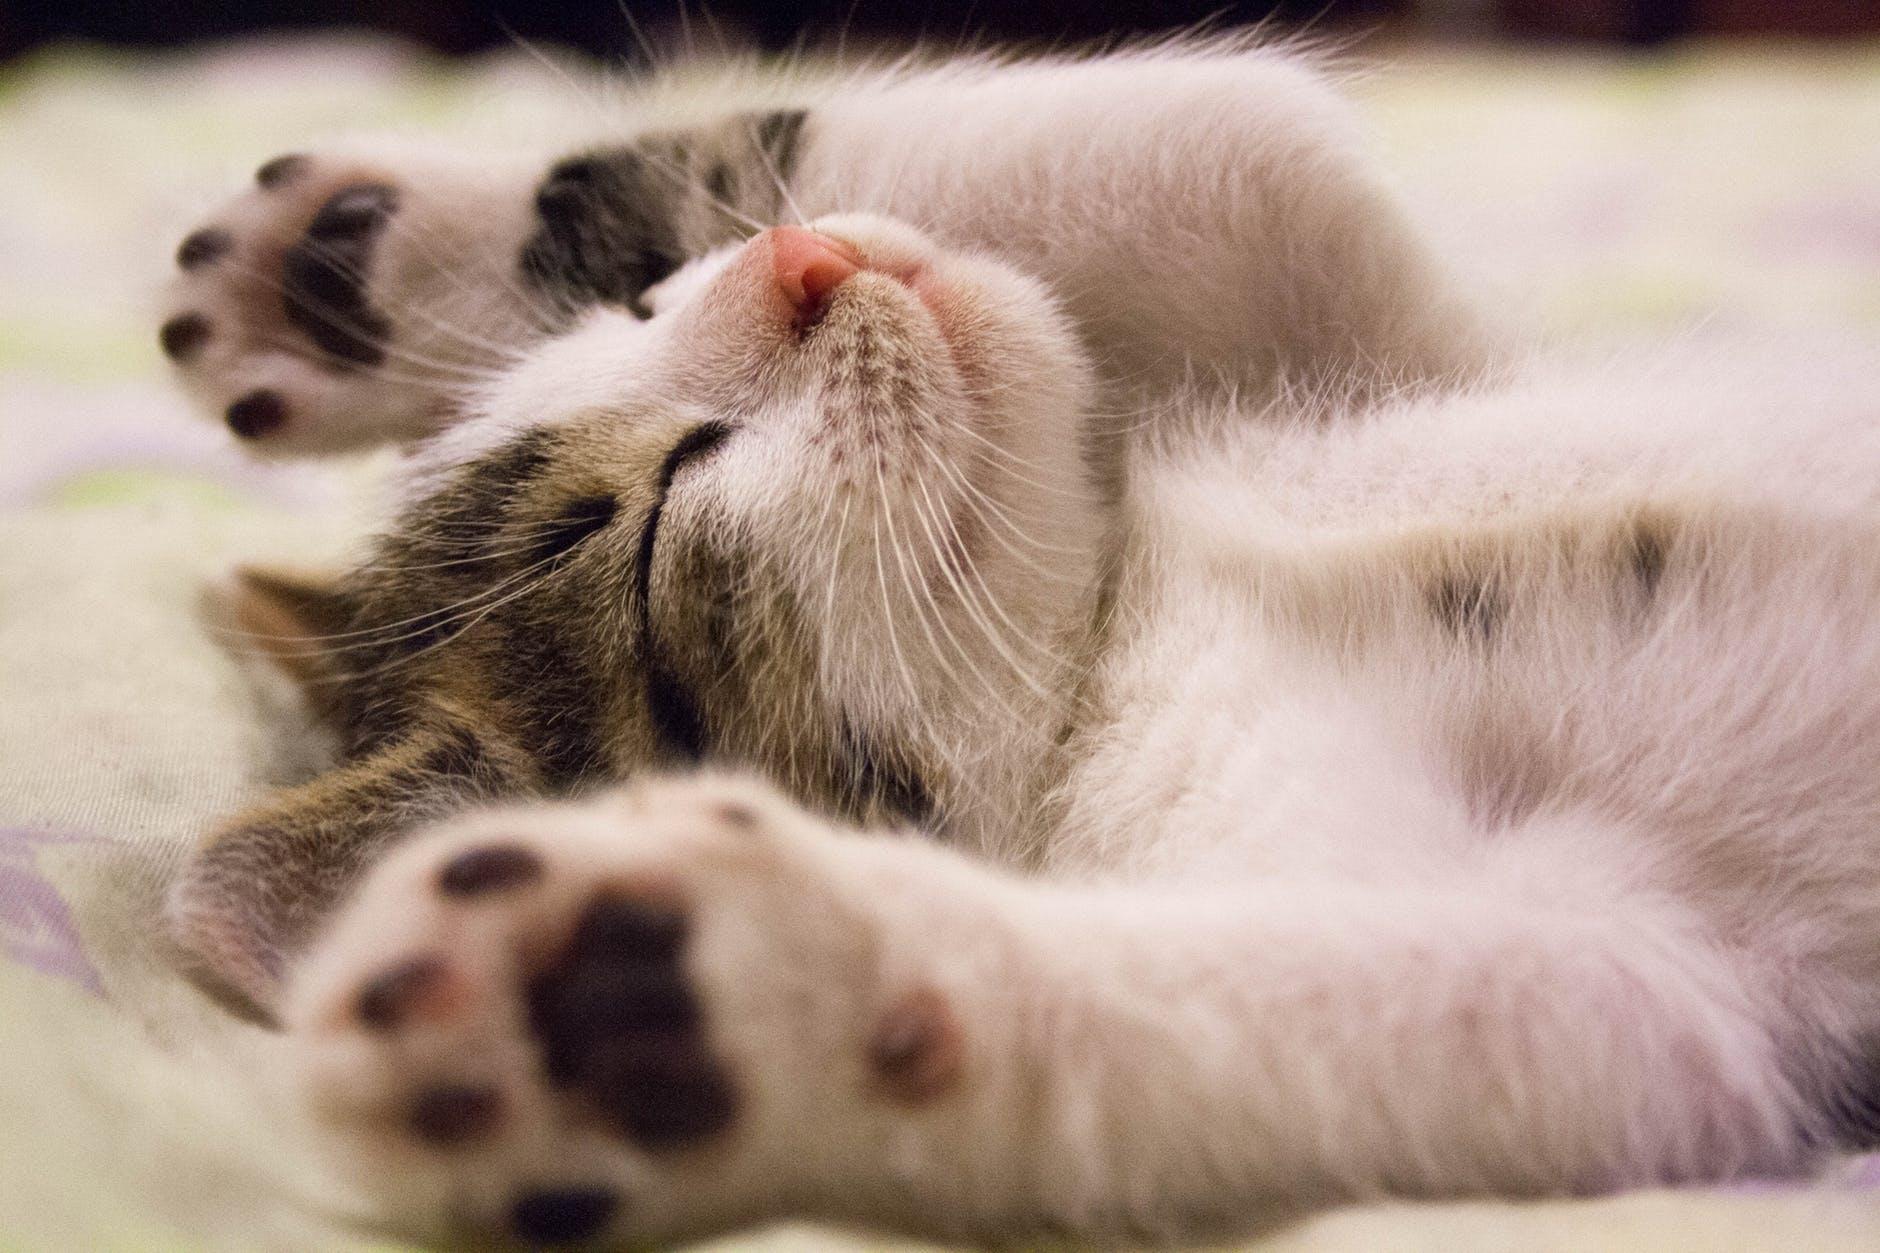 Mèo con ngủ